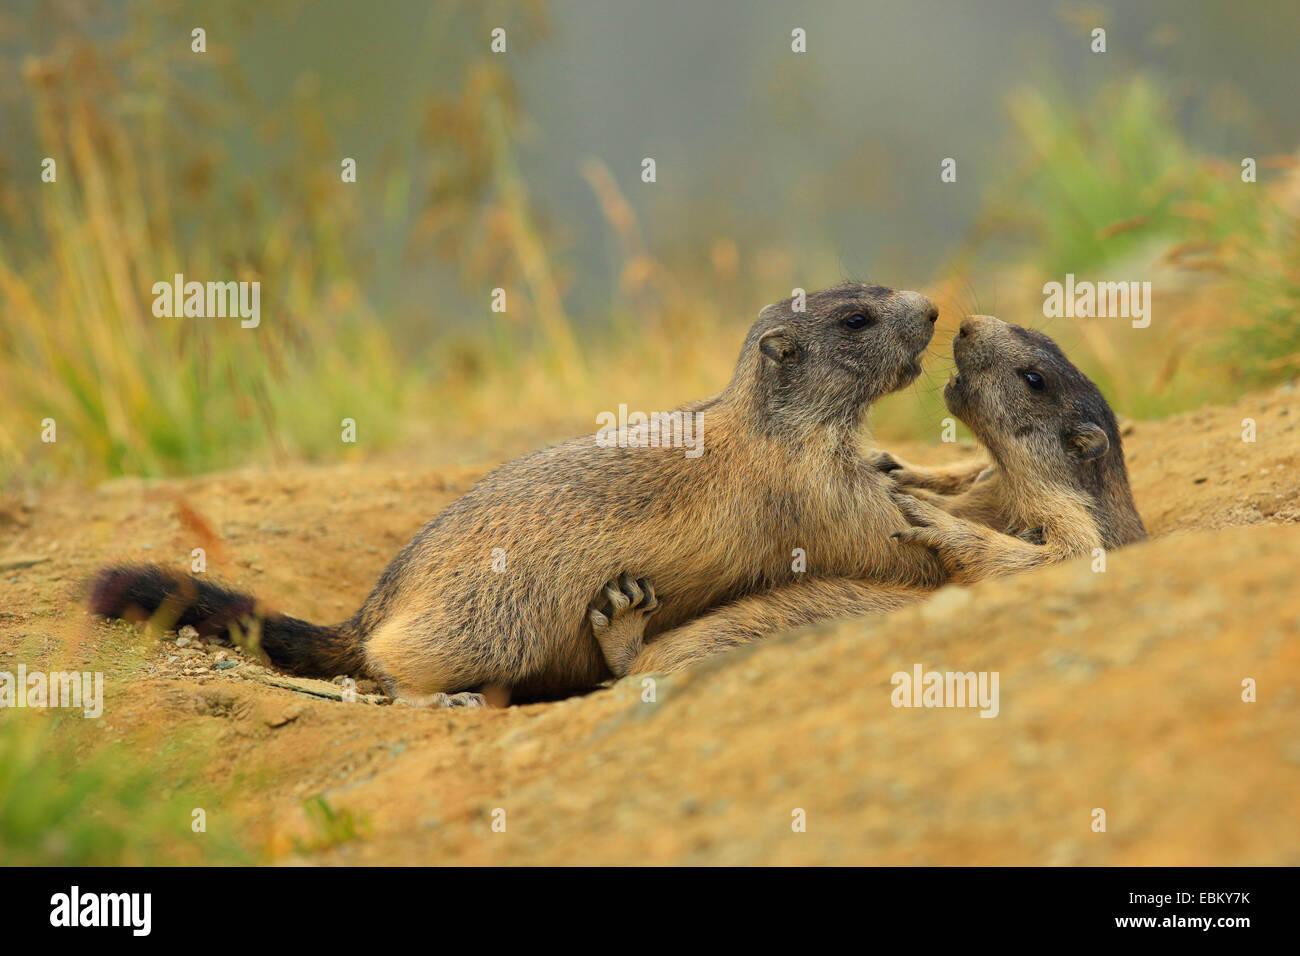 alpine marmot (Marmota marmota), playing young animals , Austria, Hohe Tauern National Park Stock Photo